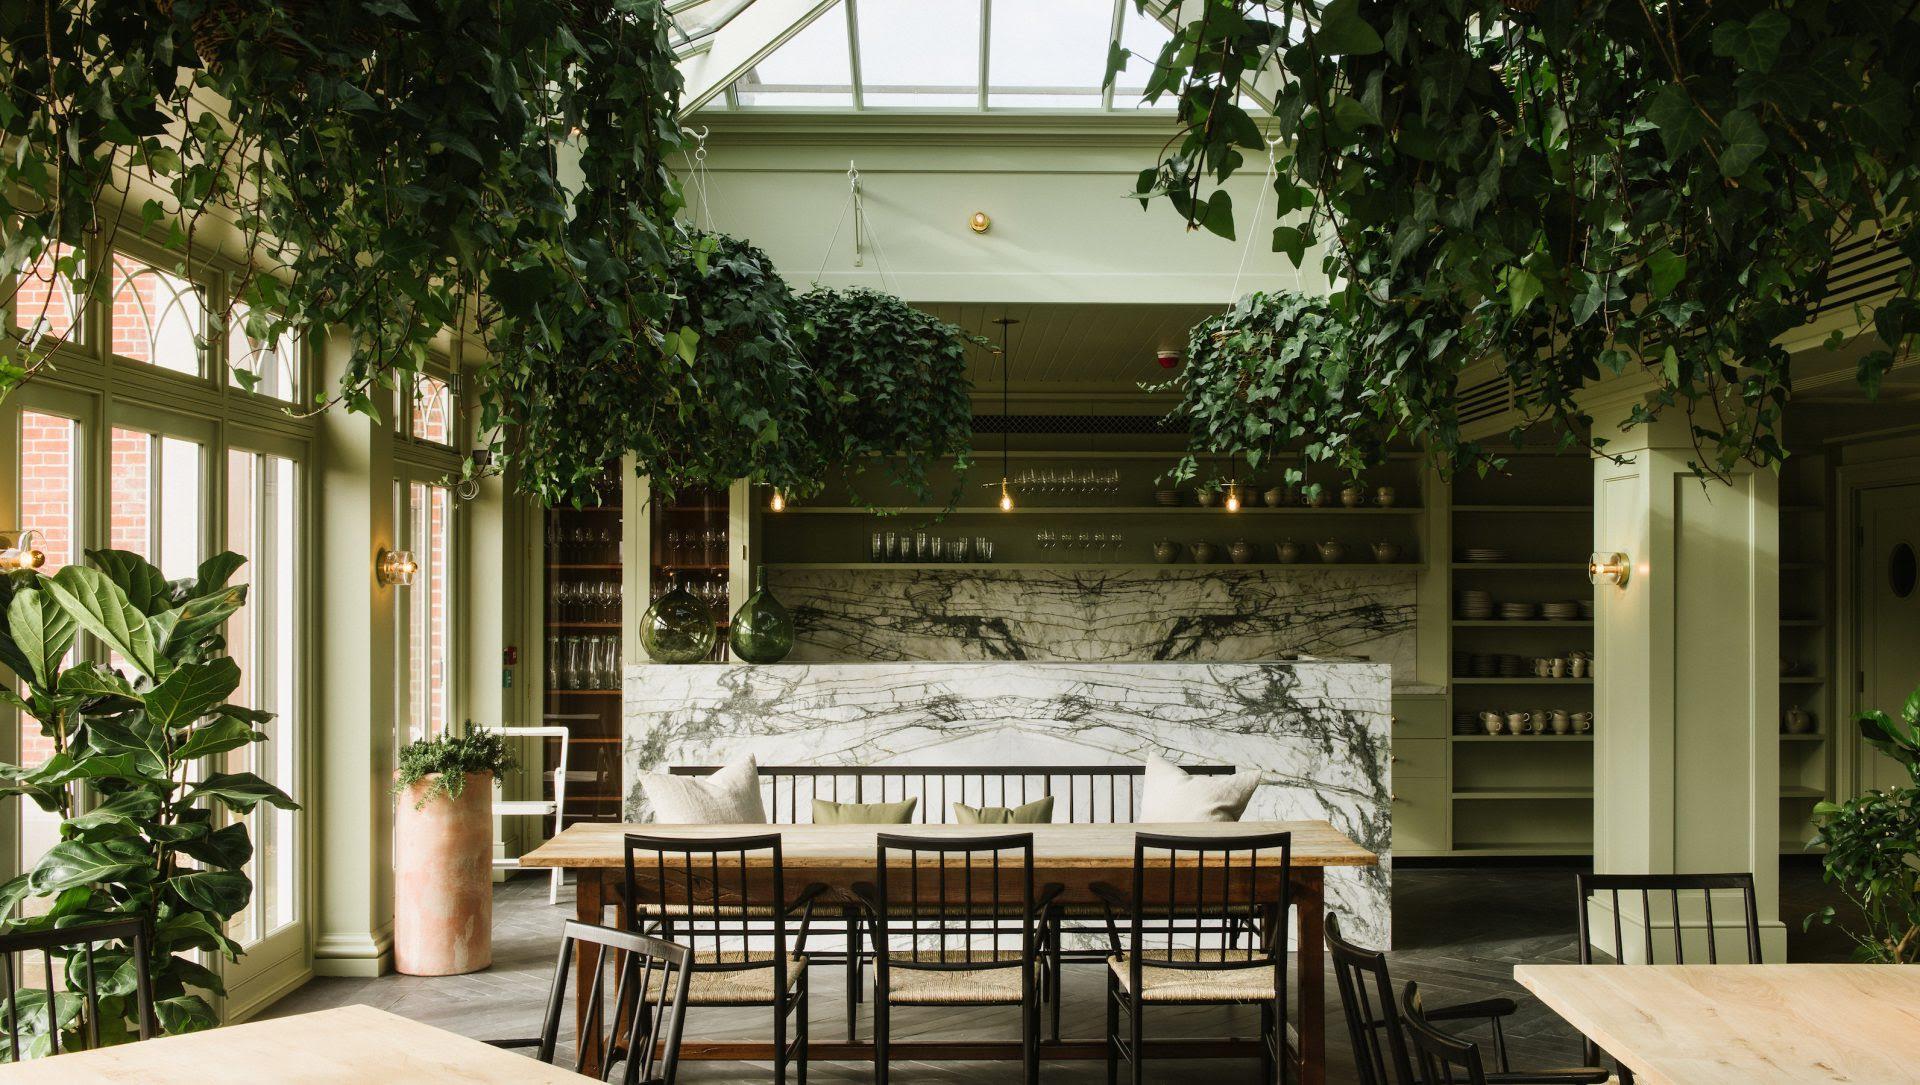 Little Emperors luxury British break clivedon house berkshire luxury hotel club